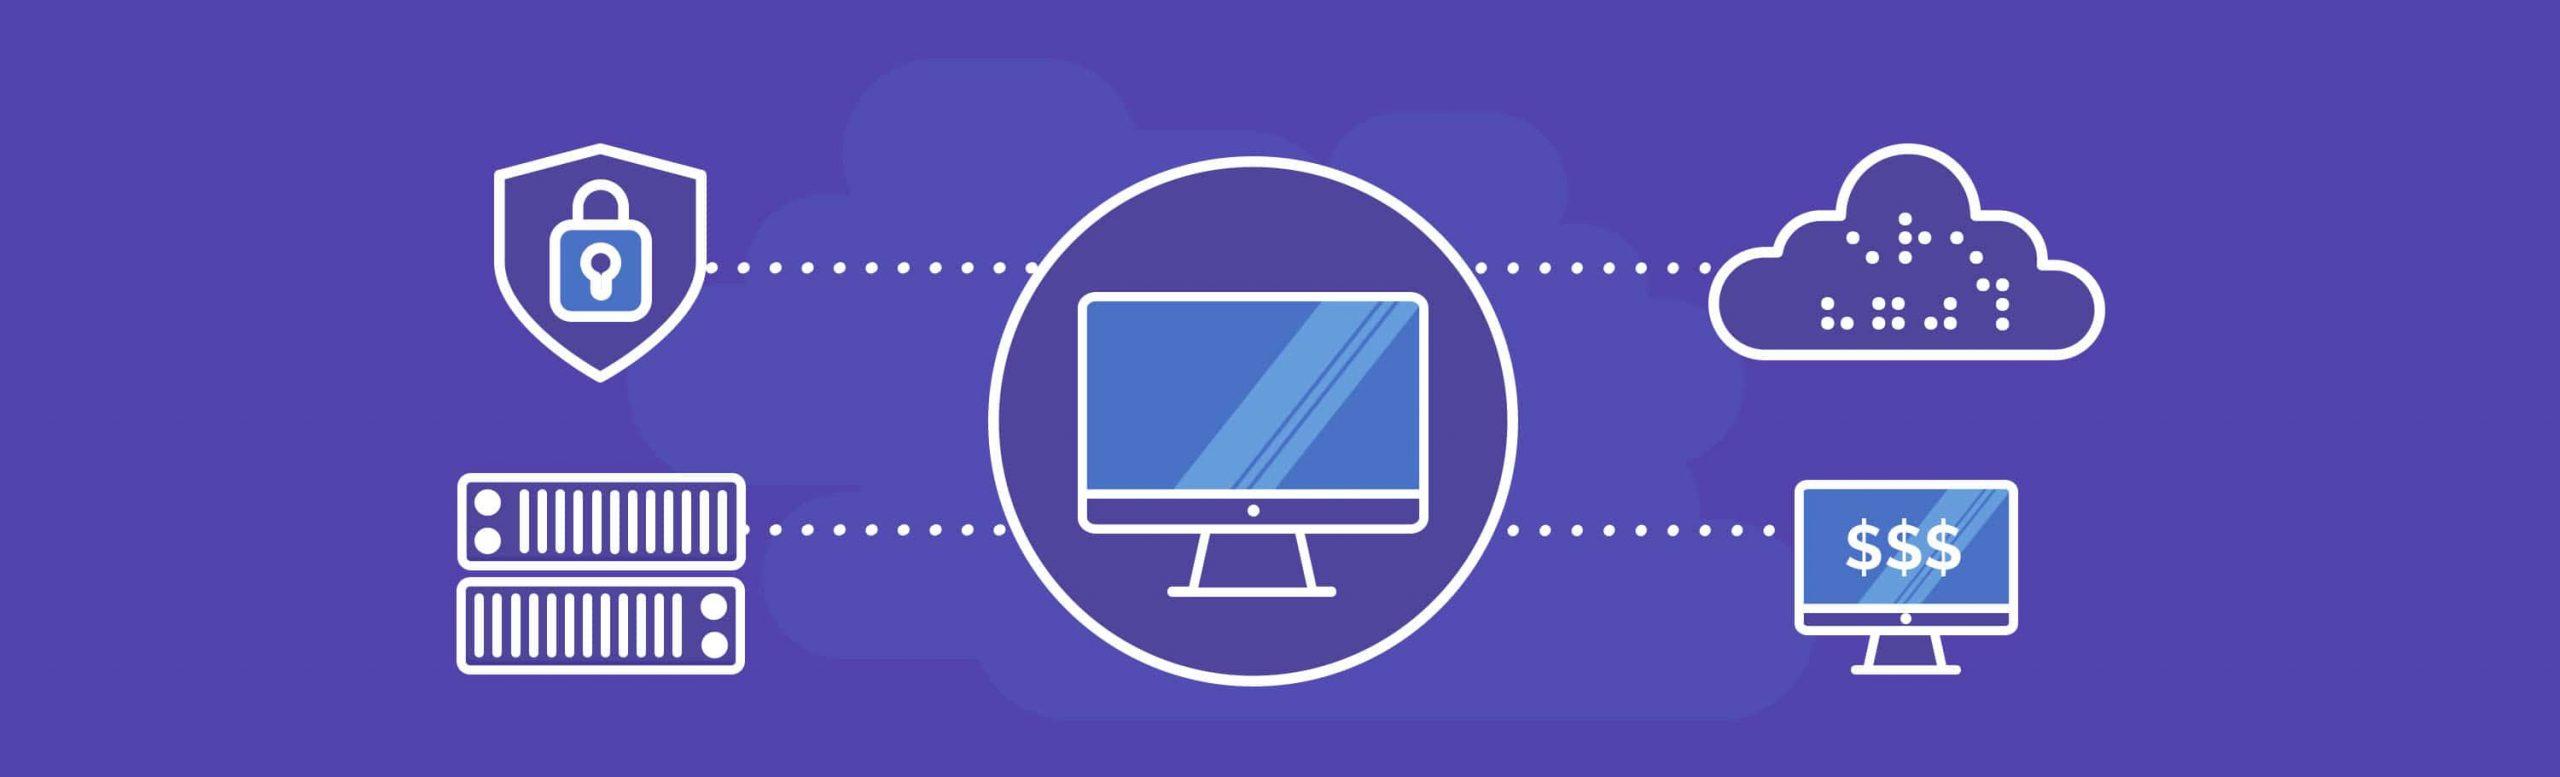 Virtual Servers for Business: Growing Scope of Virtualization in the IT Industry - HostNamaste